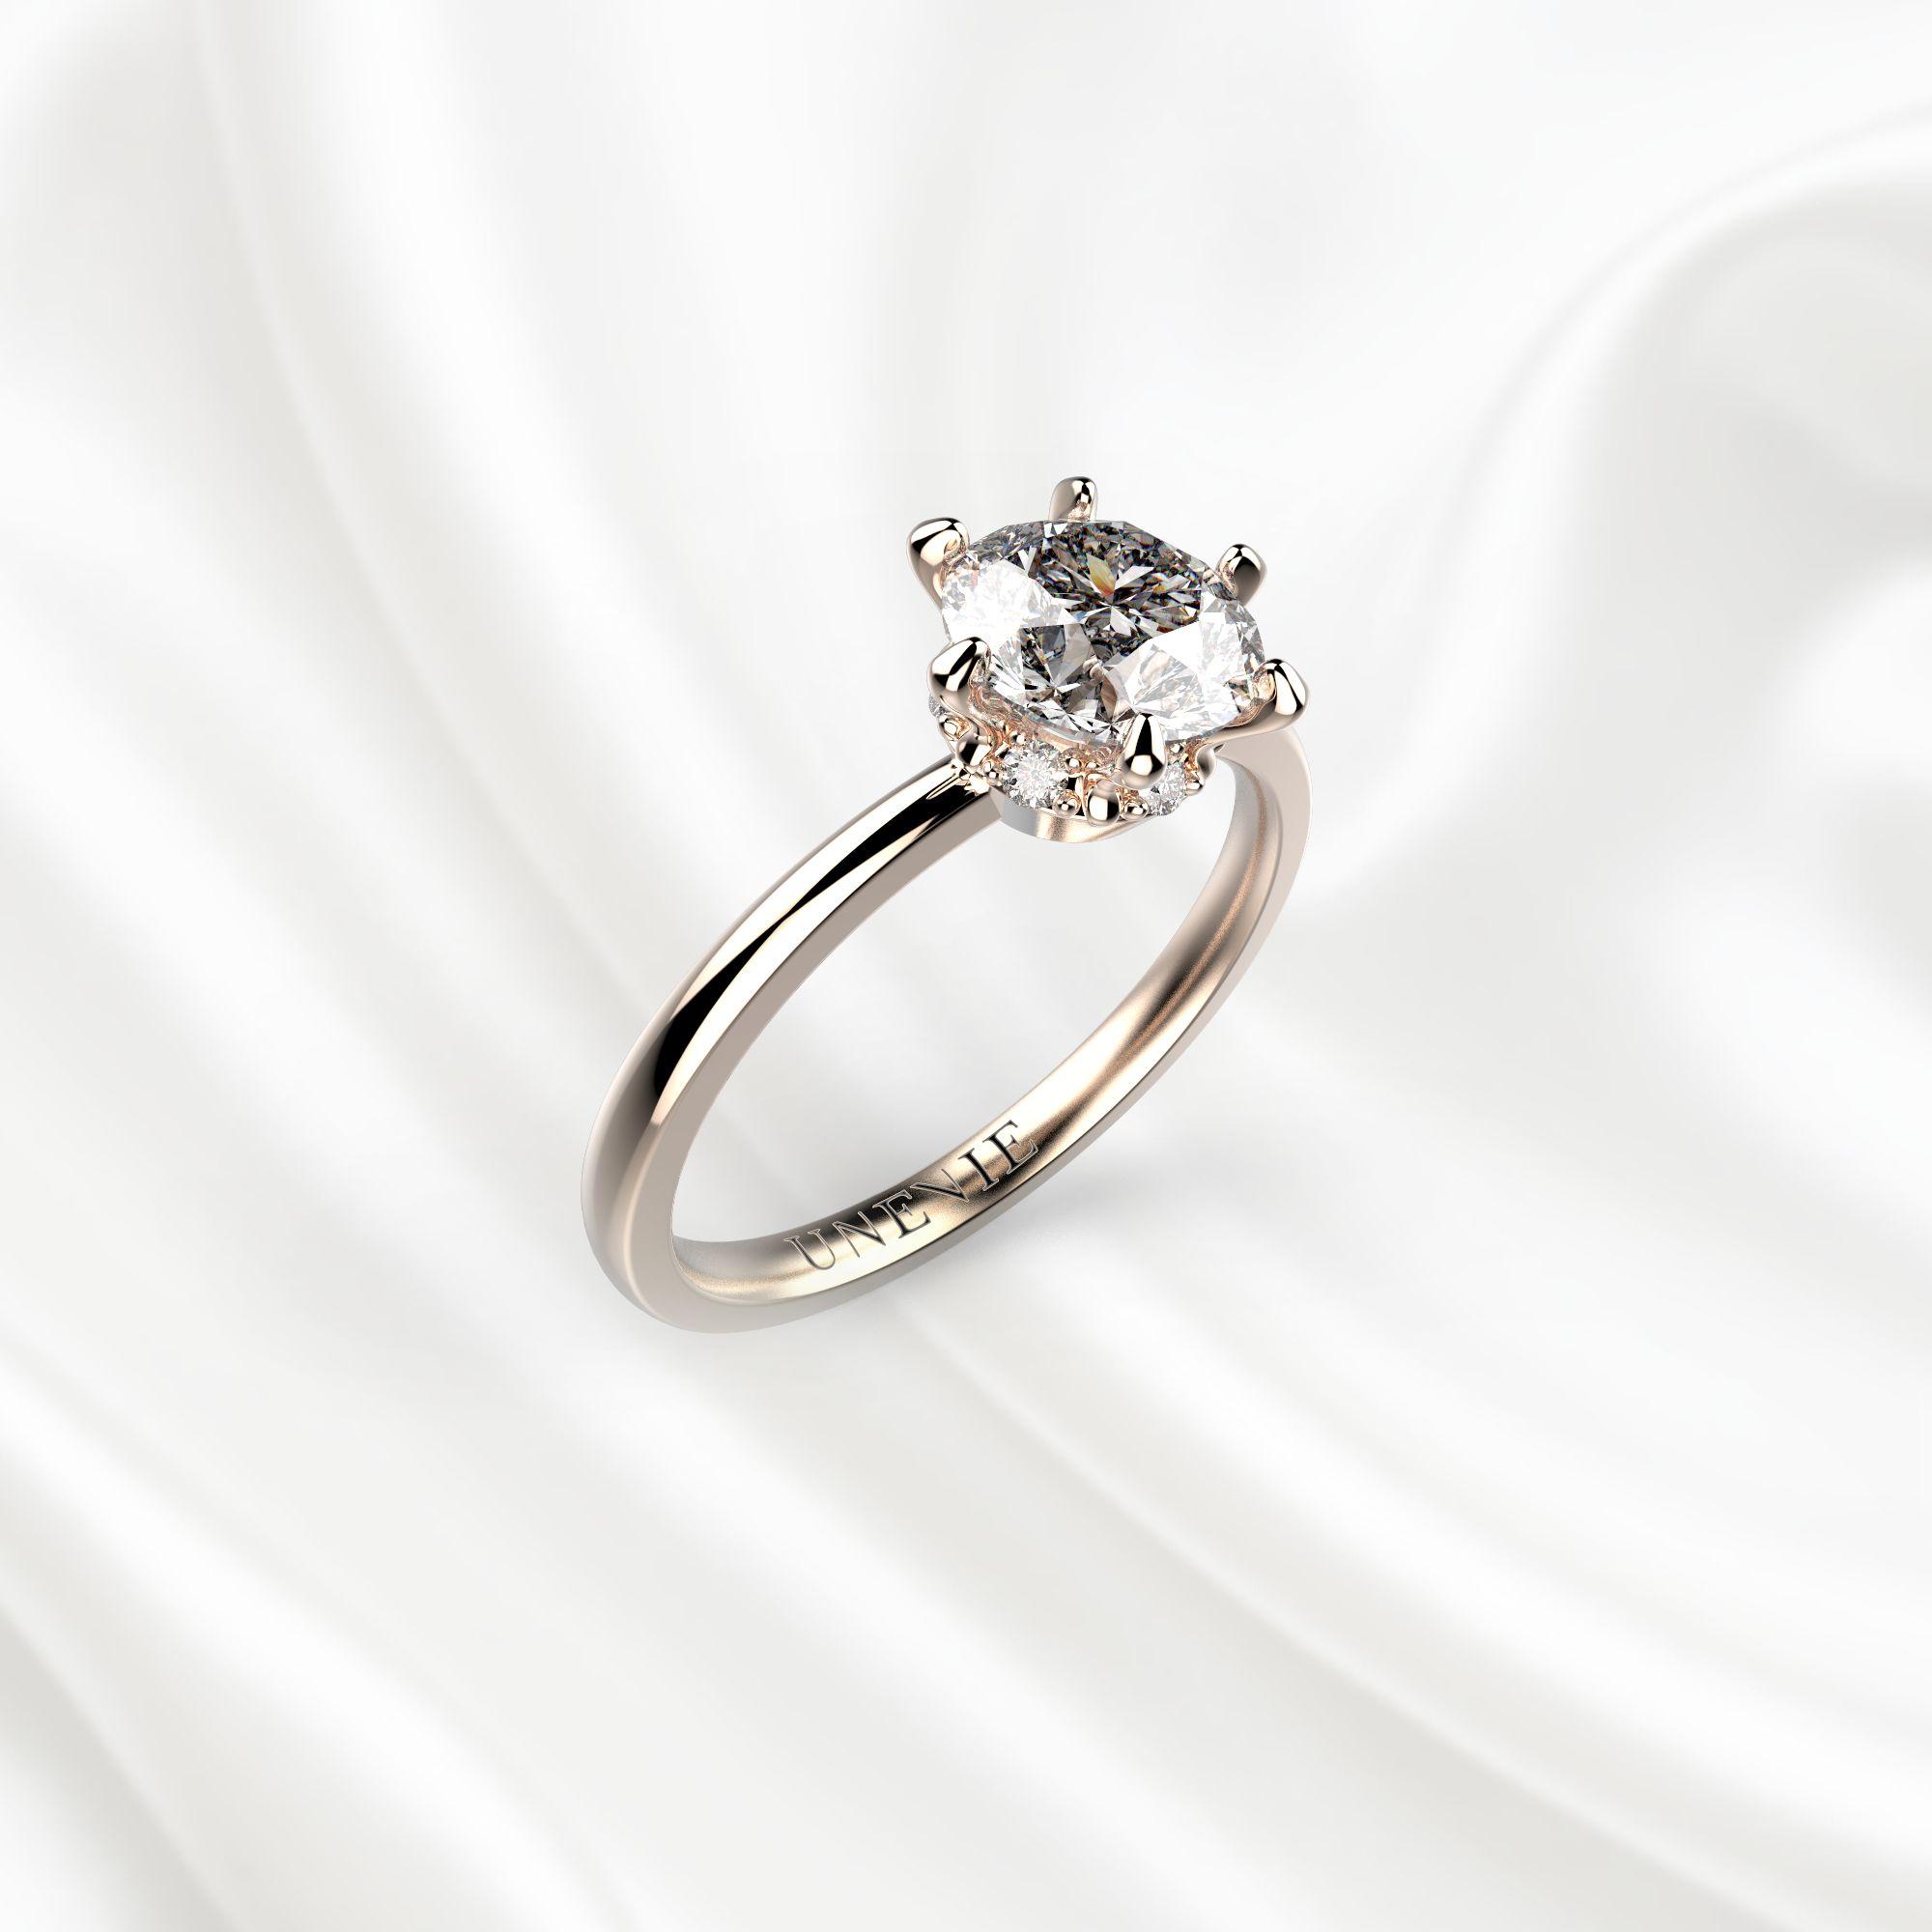 N9 Помолвочное кольцо из розового золота с бриллиантом 0.8 карат